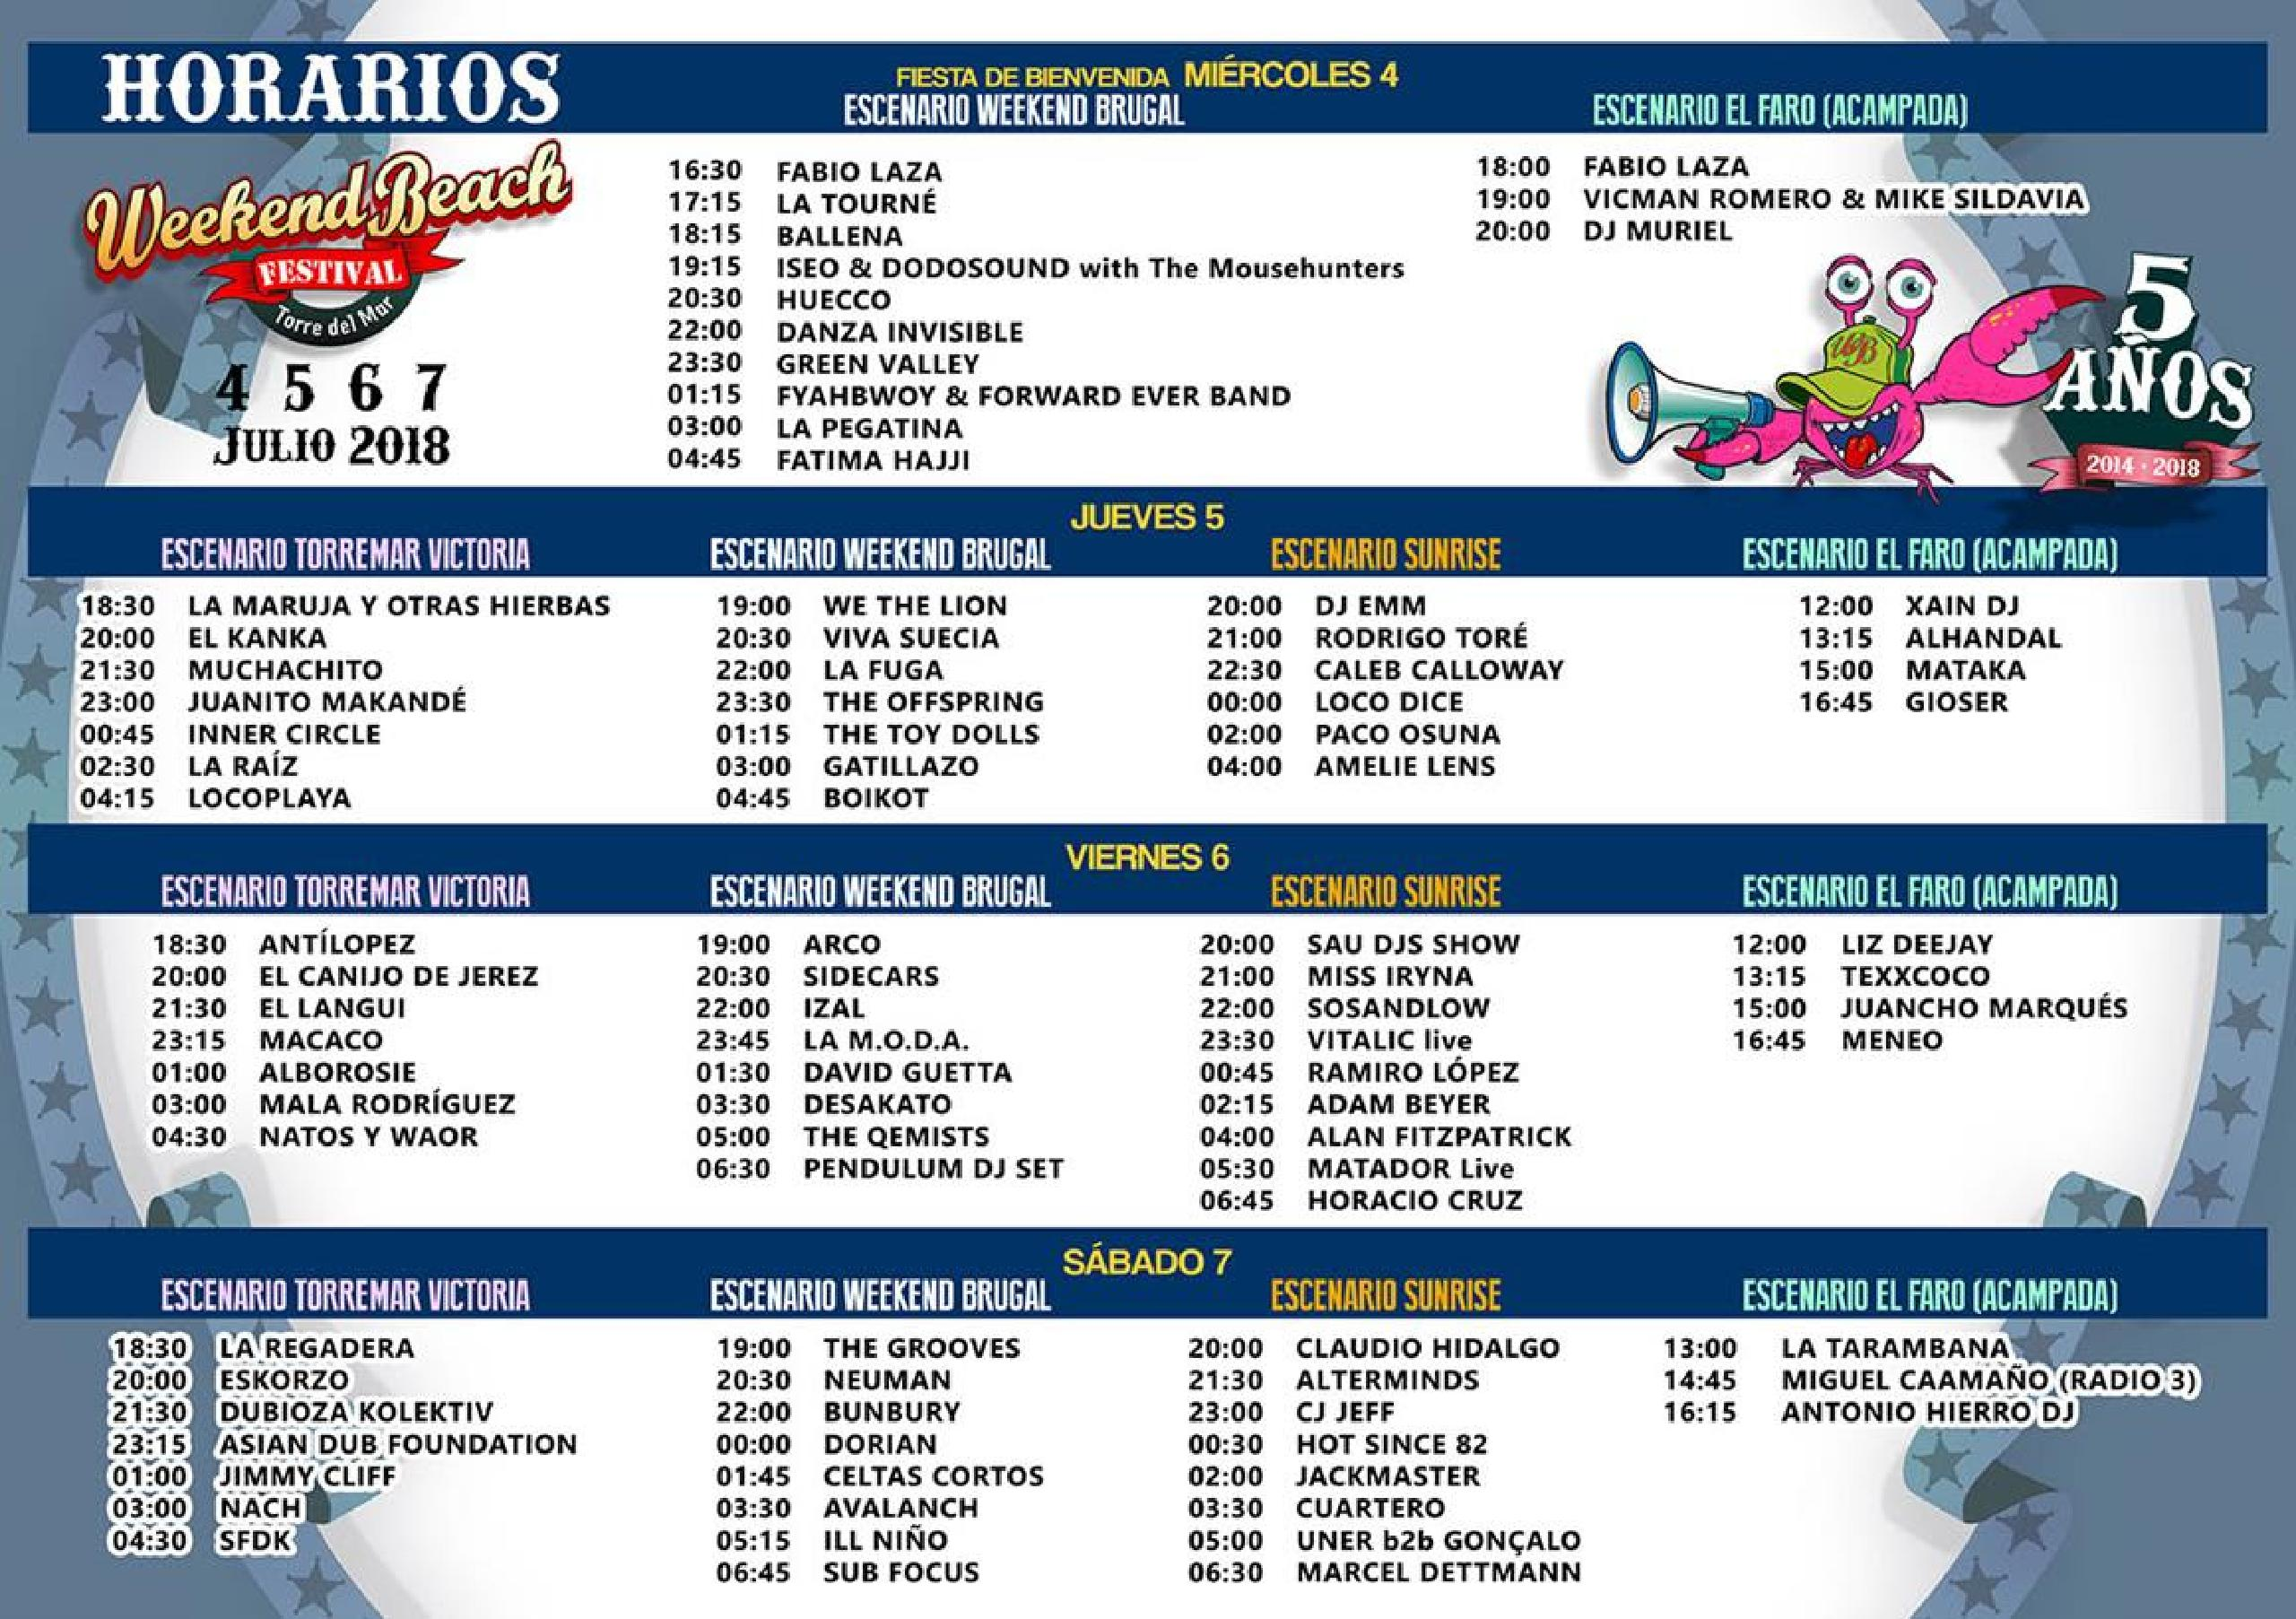 Horarios Weekend Beach Festival 2018